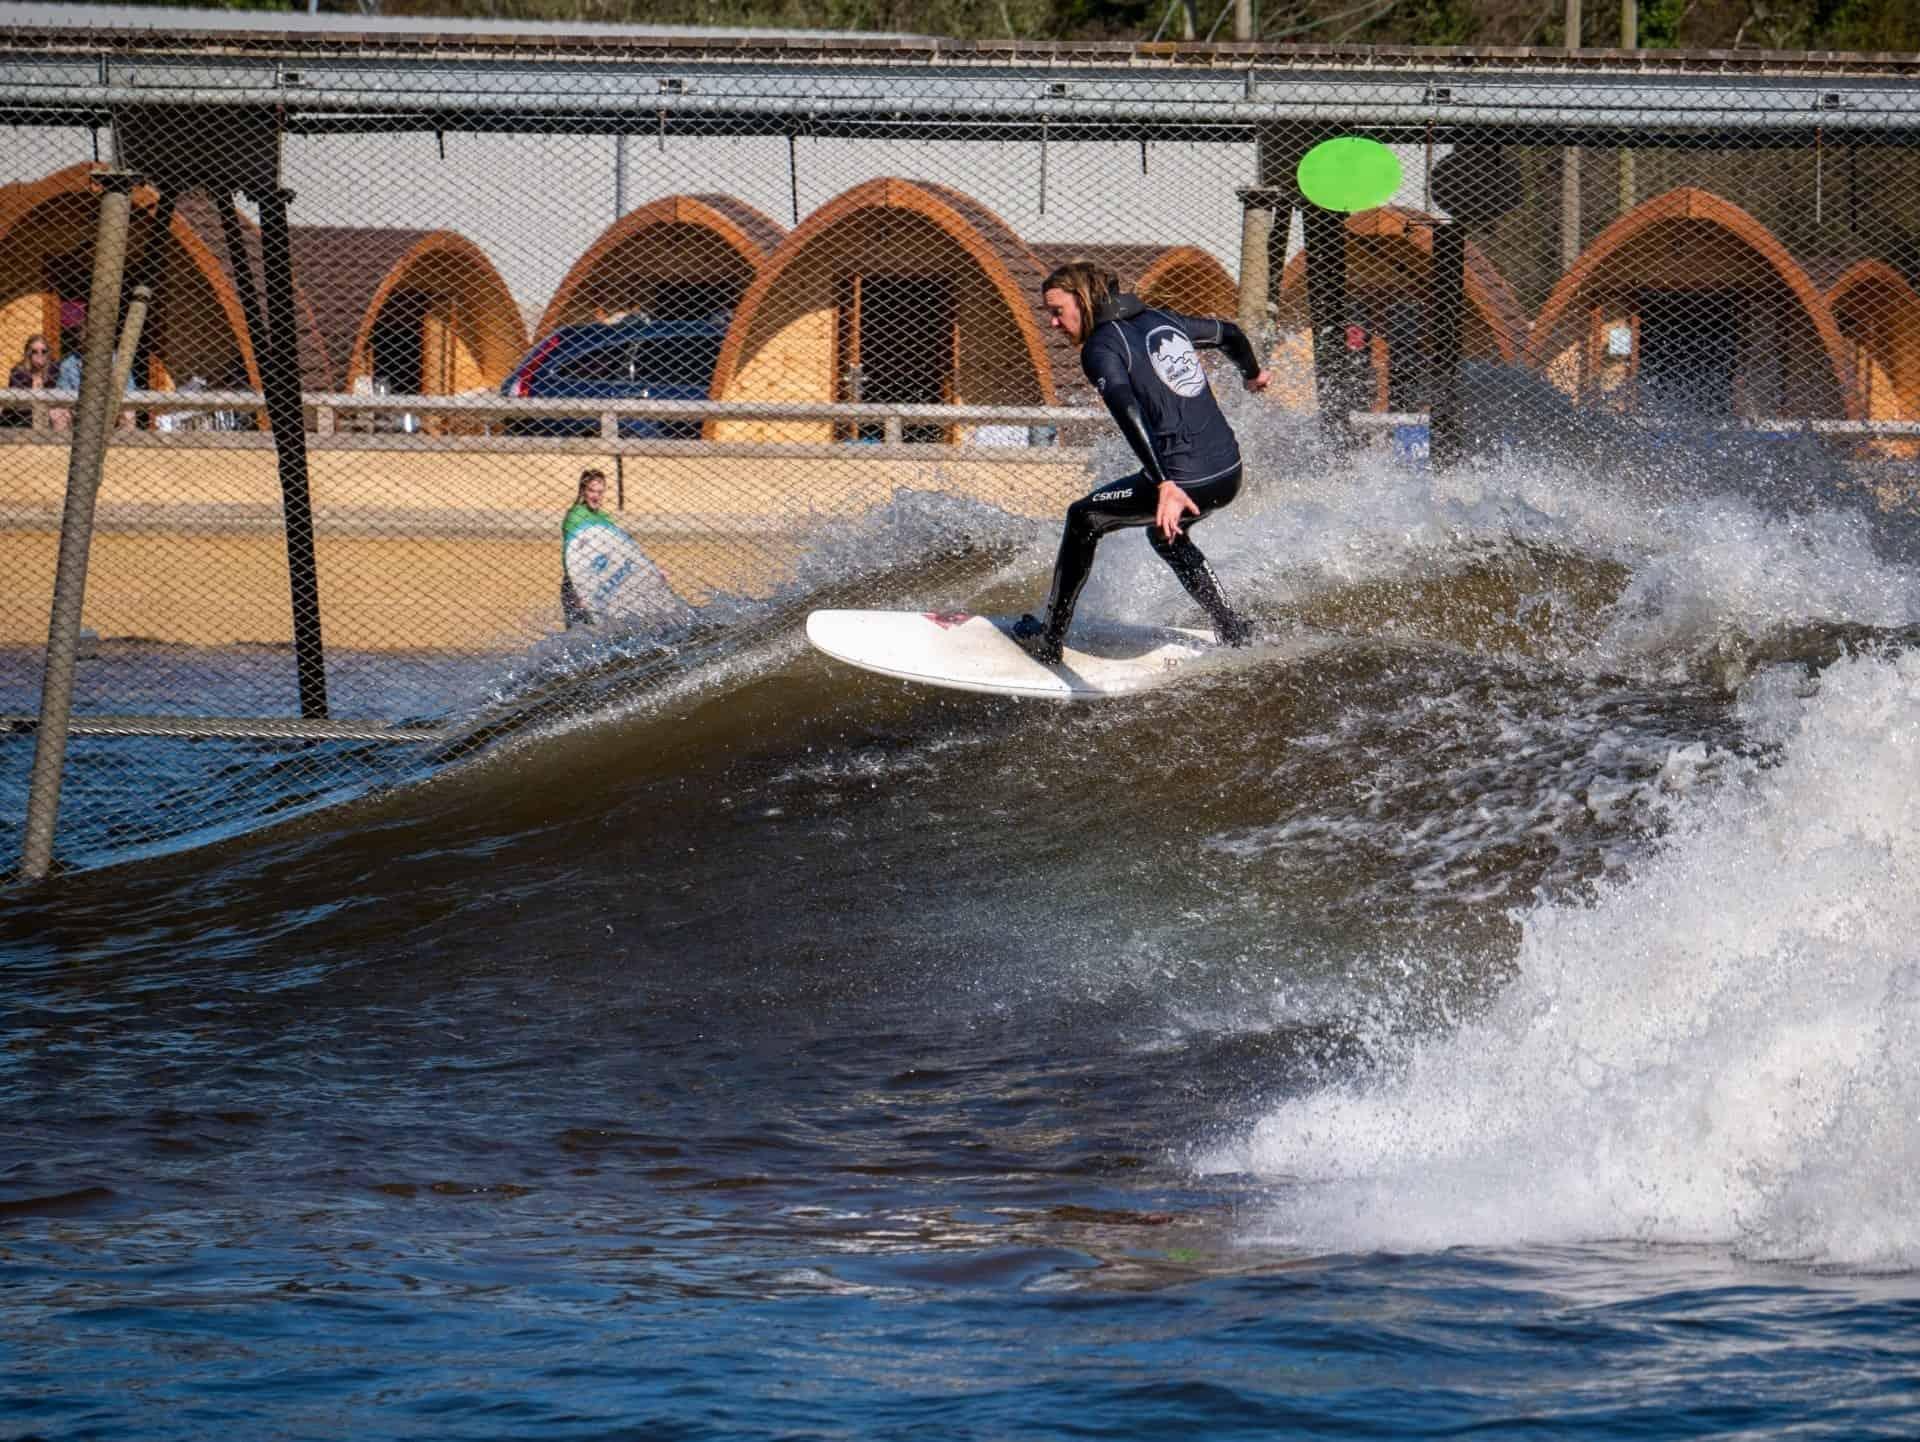 Inland surfing at Surf Snodonia